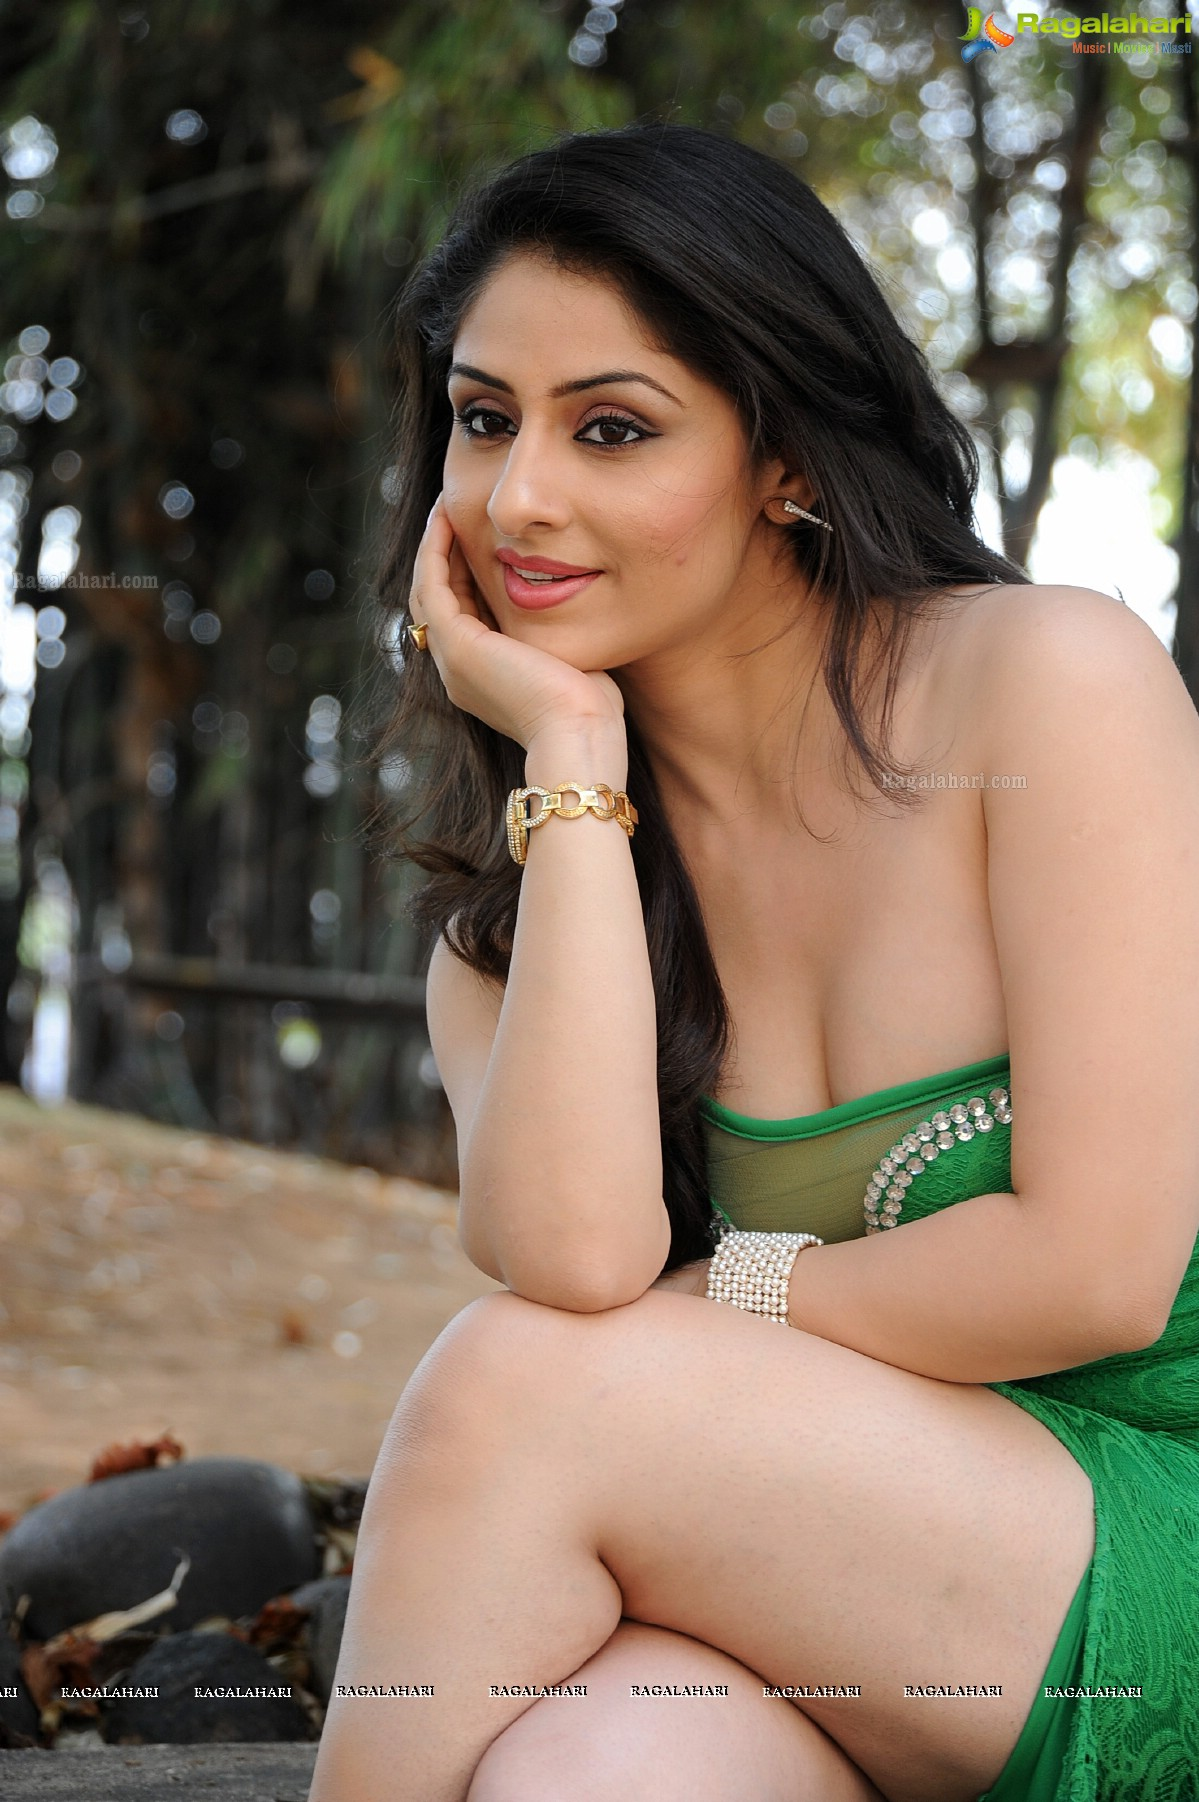 Beautiful desi mysore aunty in low hip saree in public - 2 2